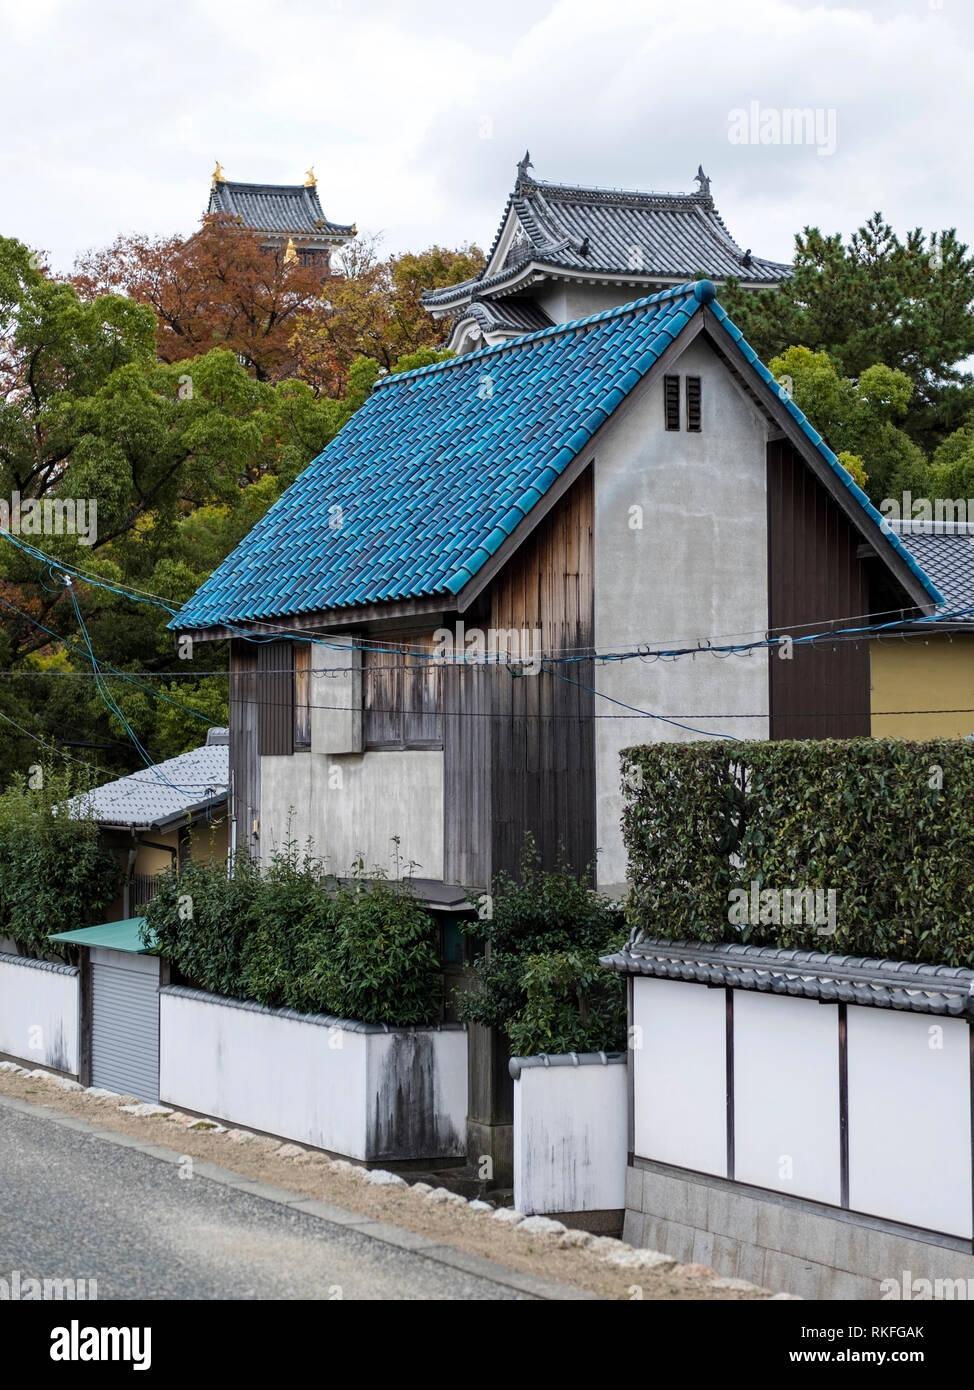 Traditional Japanese house with enameled blue roof tiles, Okayama, Japan - Stock Image